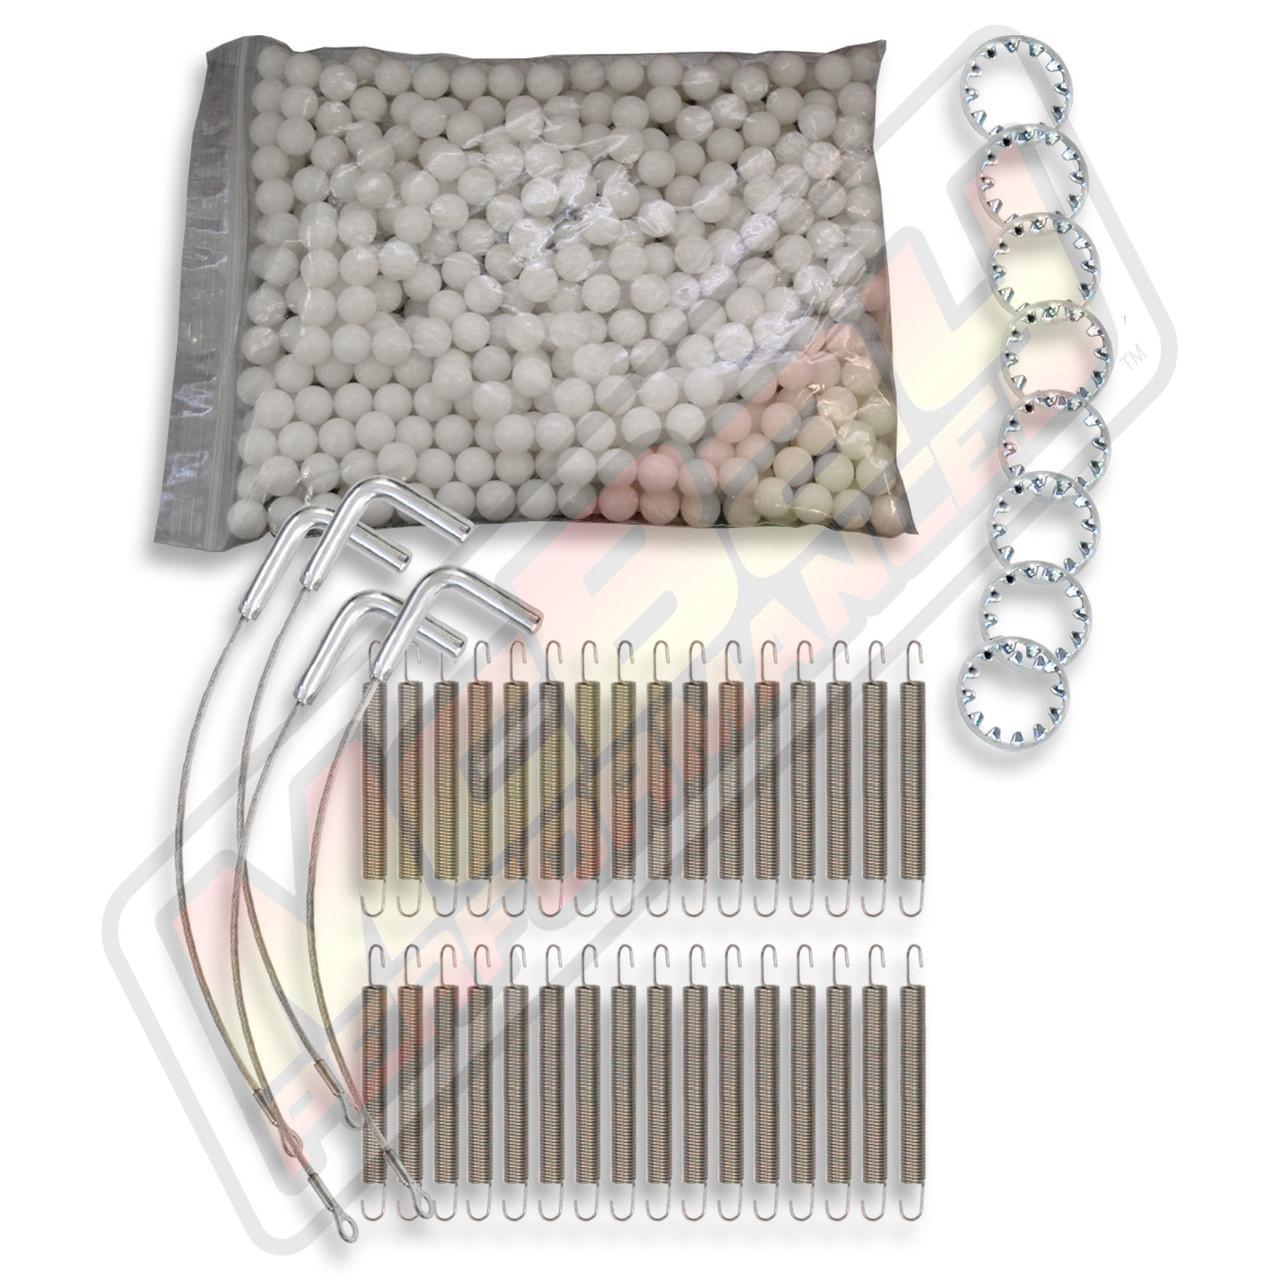 Hunter D /& RL Alignment Rack Rear Slip Plate Repair Kit with Retainer Rings